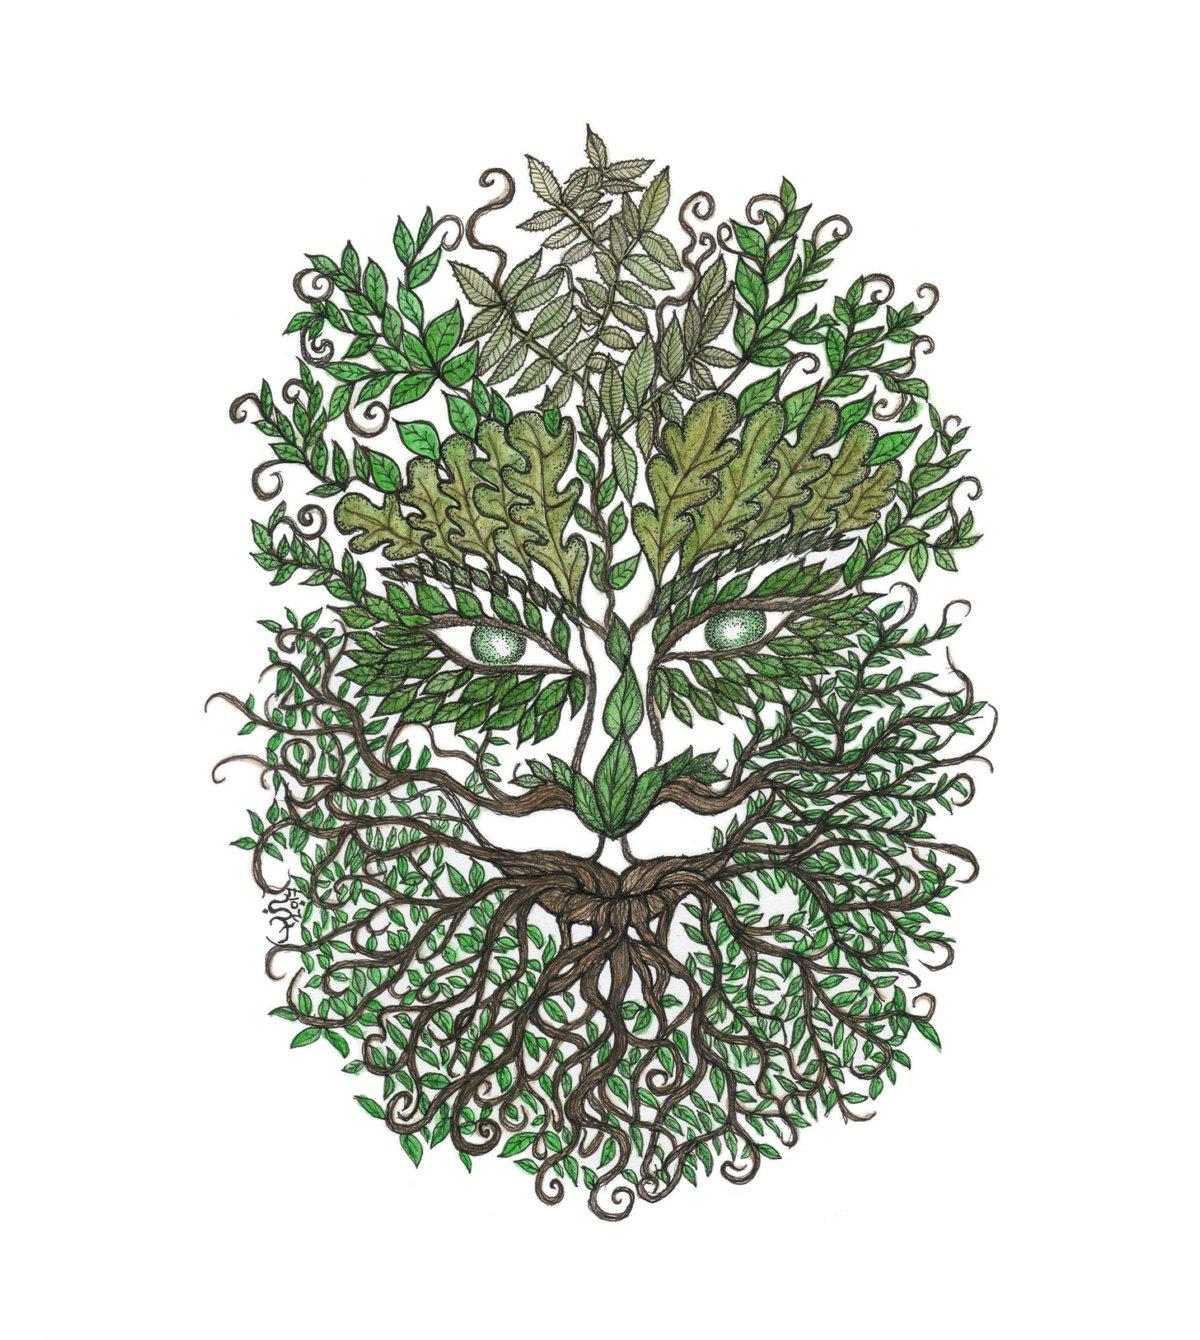 Bearded Green Man art print